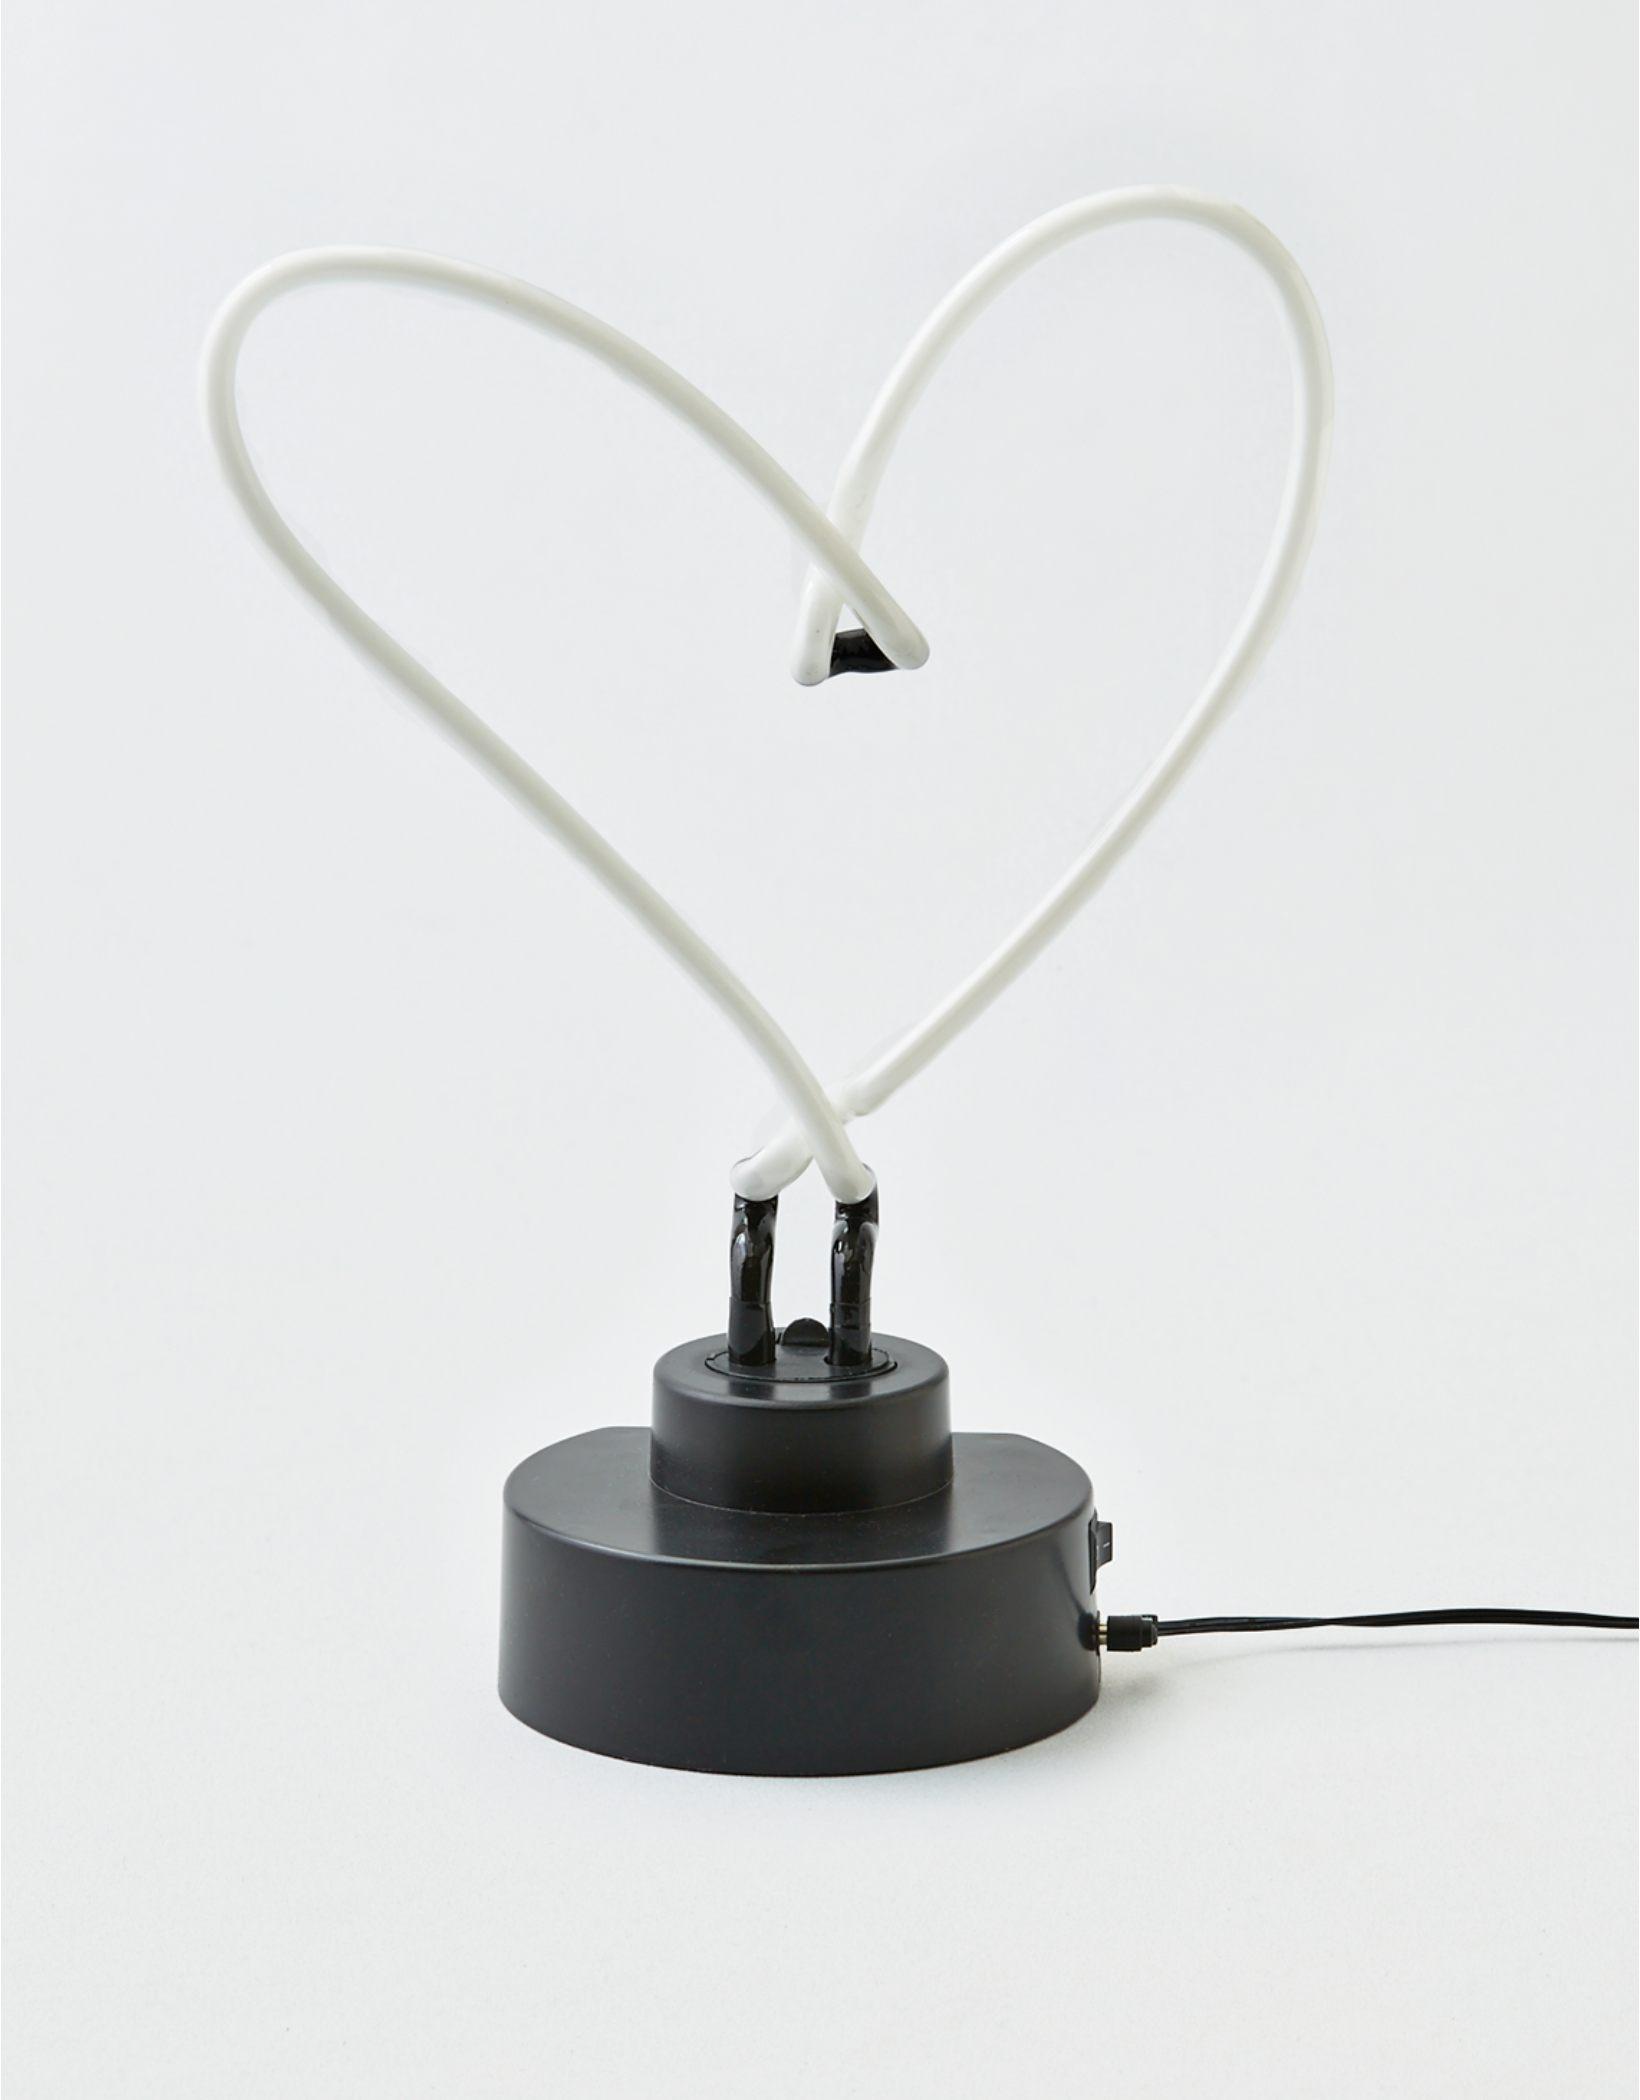 Neon Heart Lamp